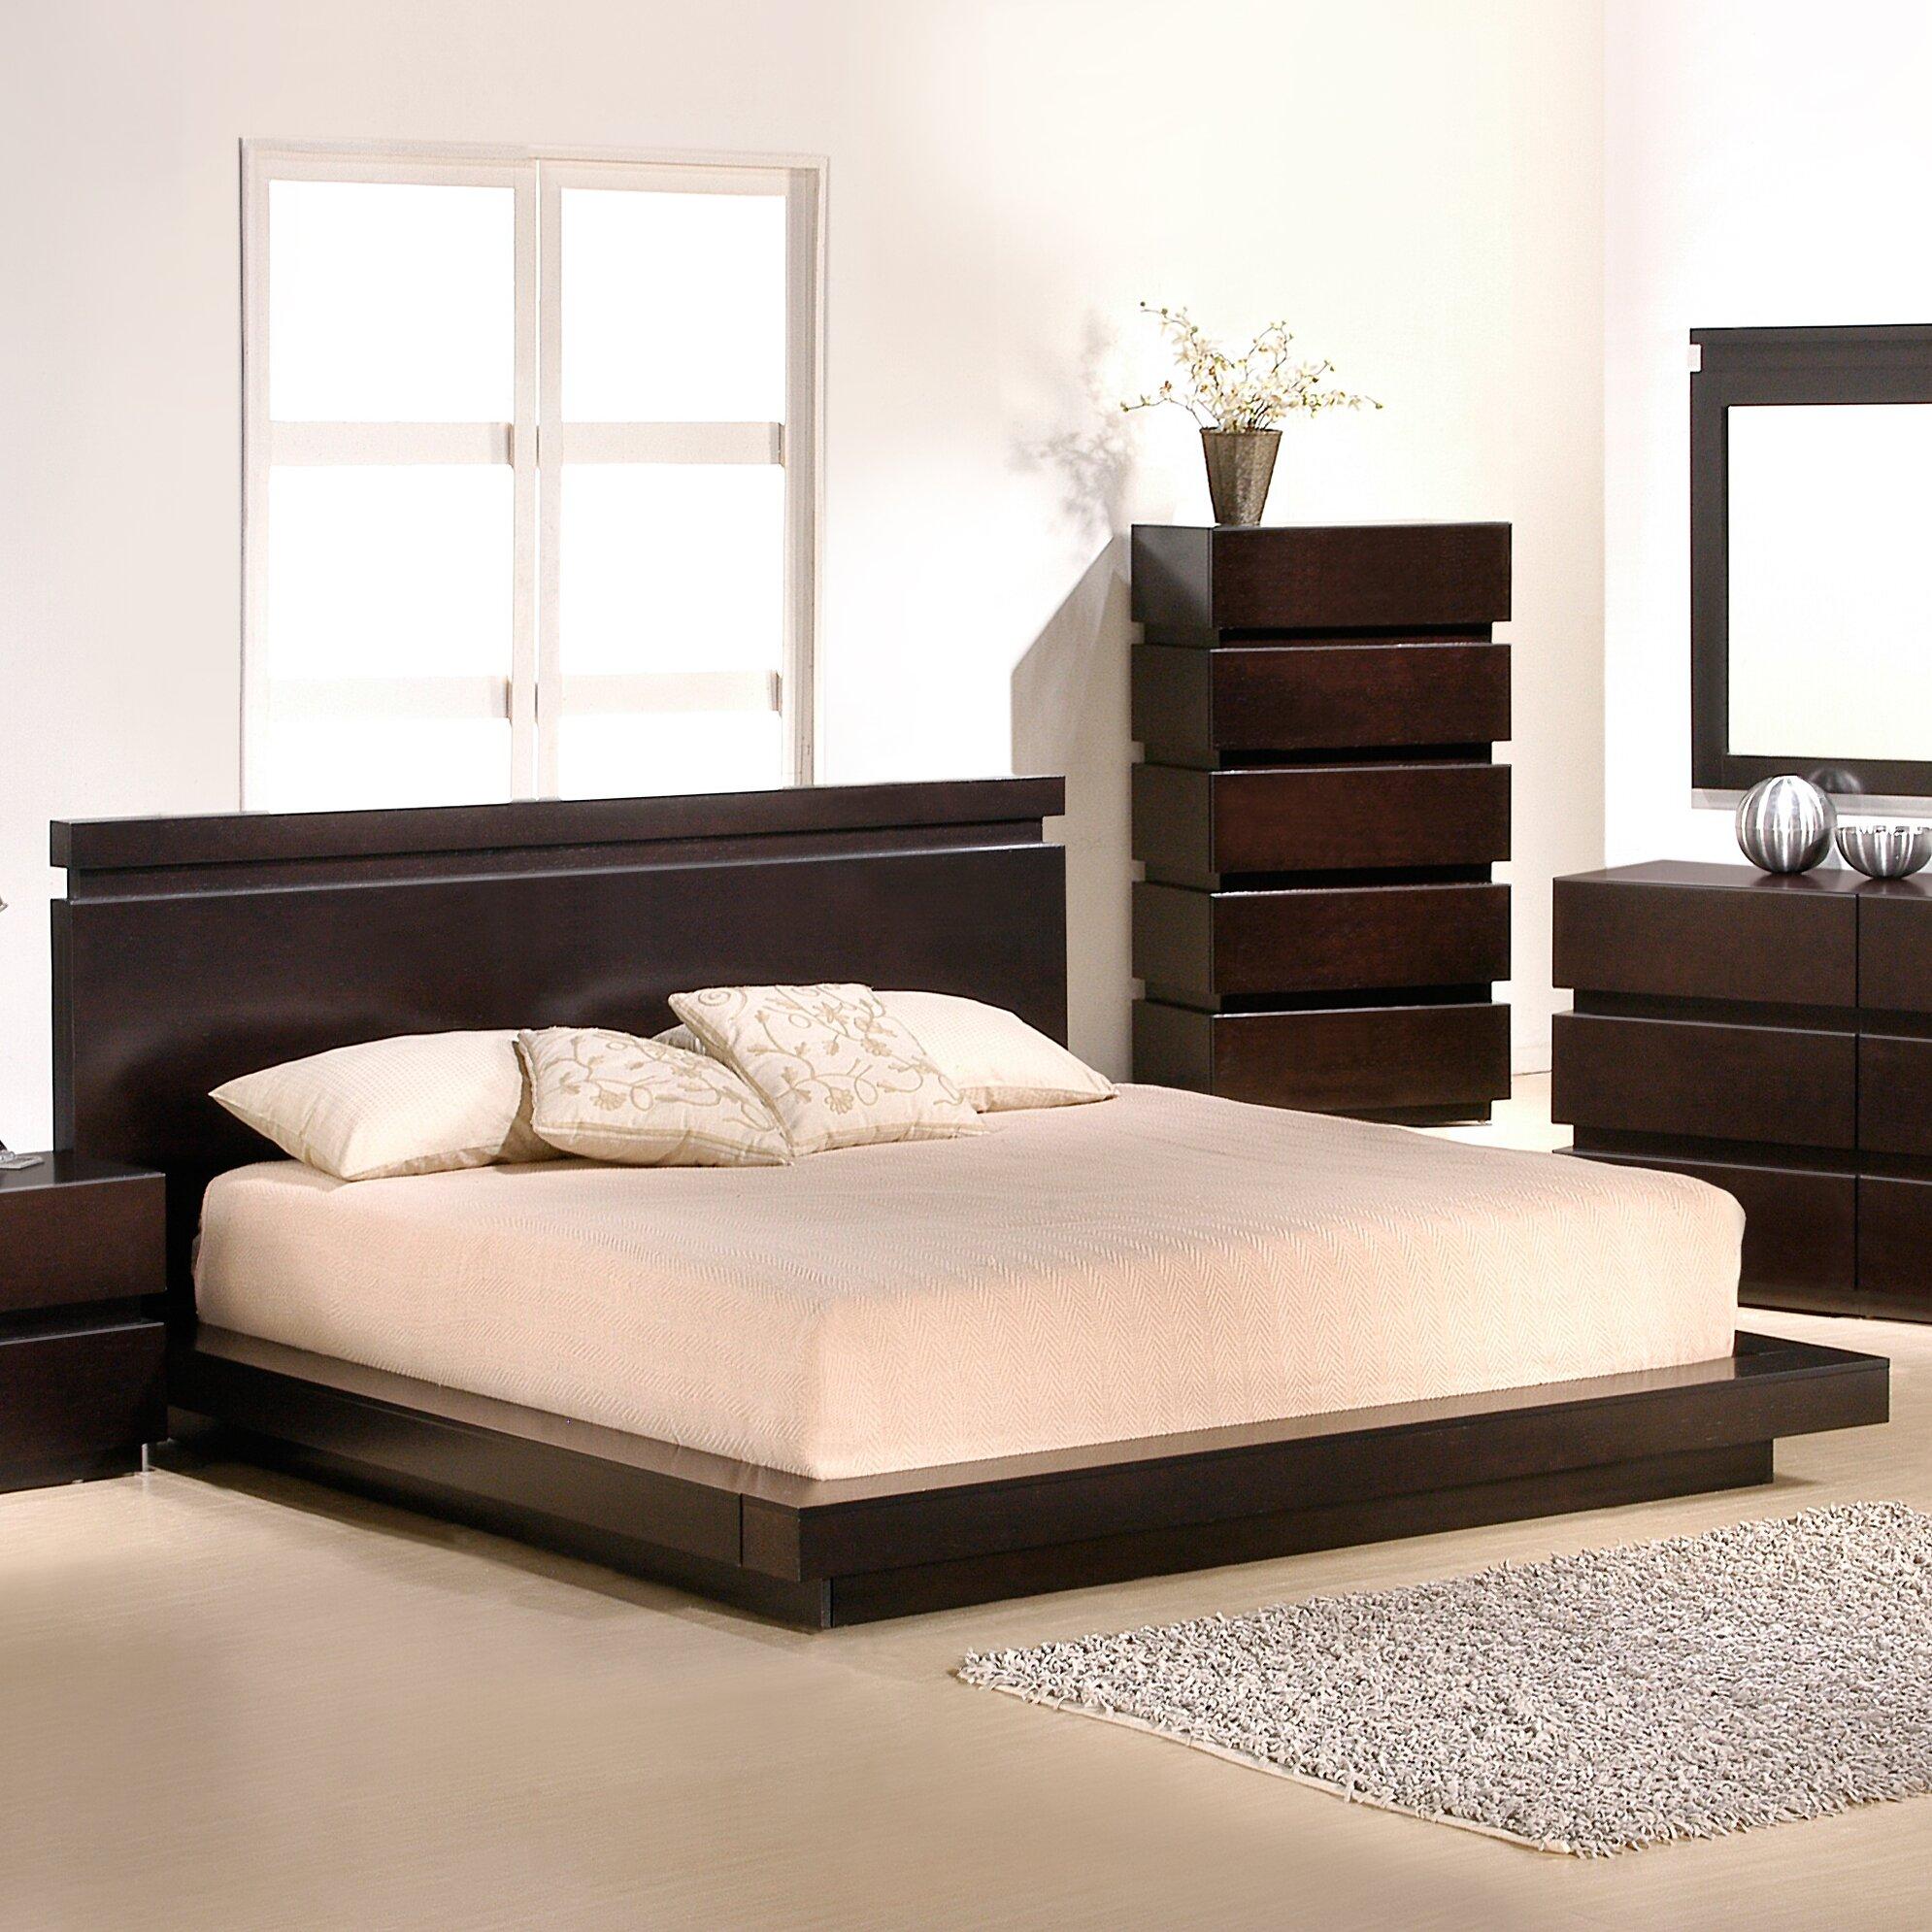 Platform Bedroom Sets Bedroom Colours As Per Vastu Bedroom Decorating Ideas Plum Bedroom Lighting Next: J&M Furniture Knotch Platform Bed & Reviews